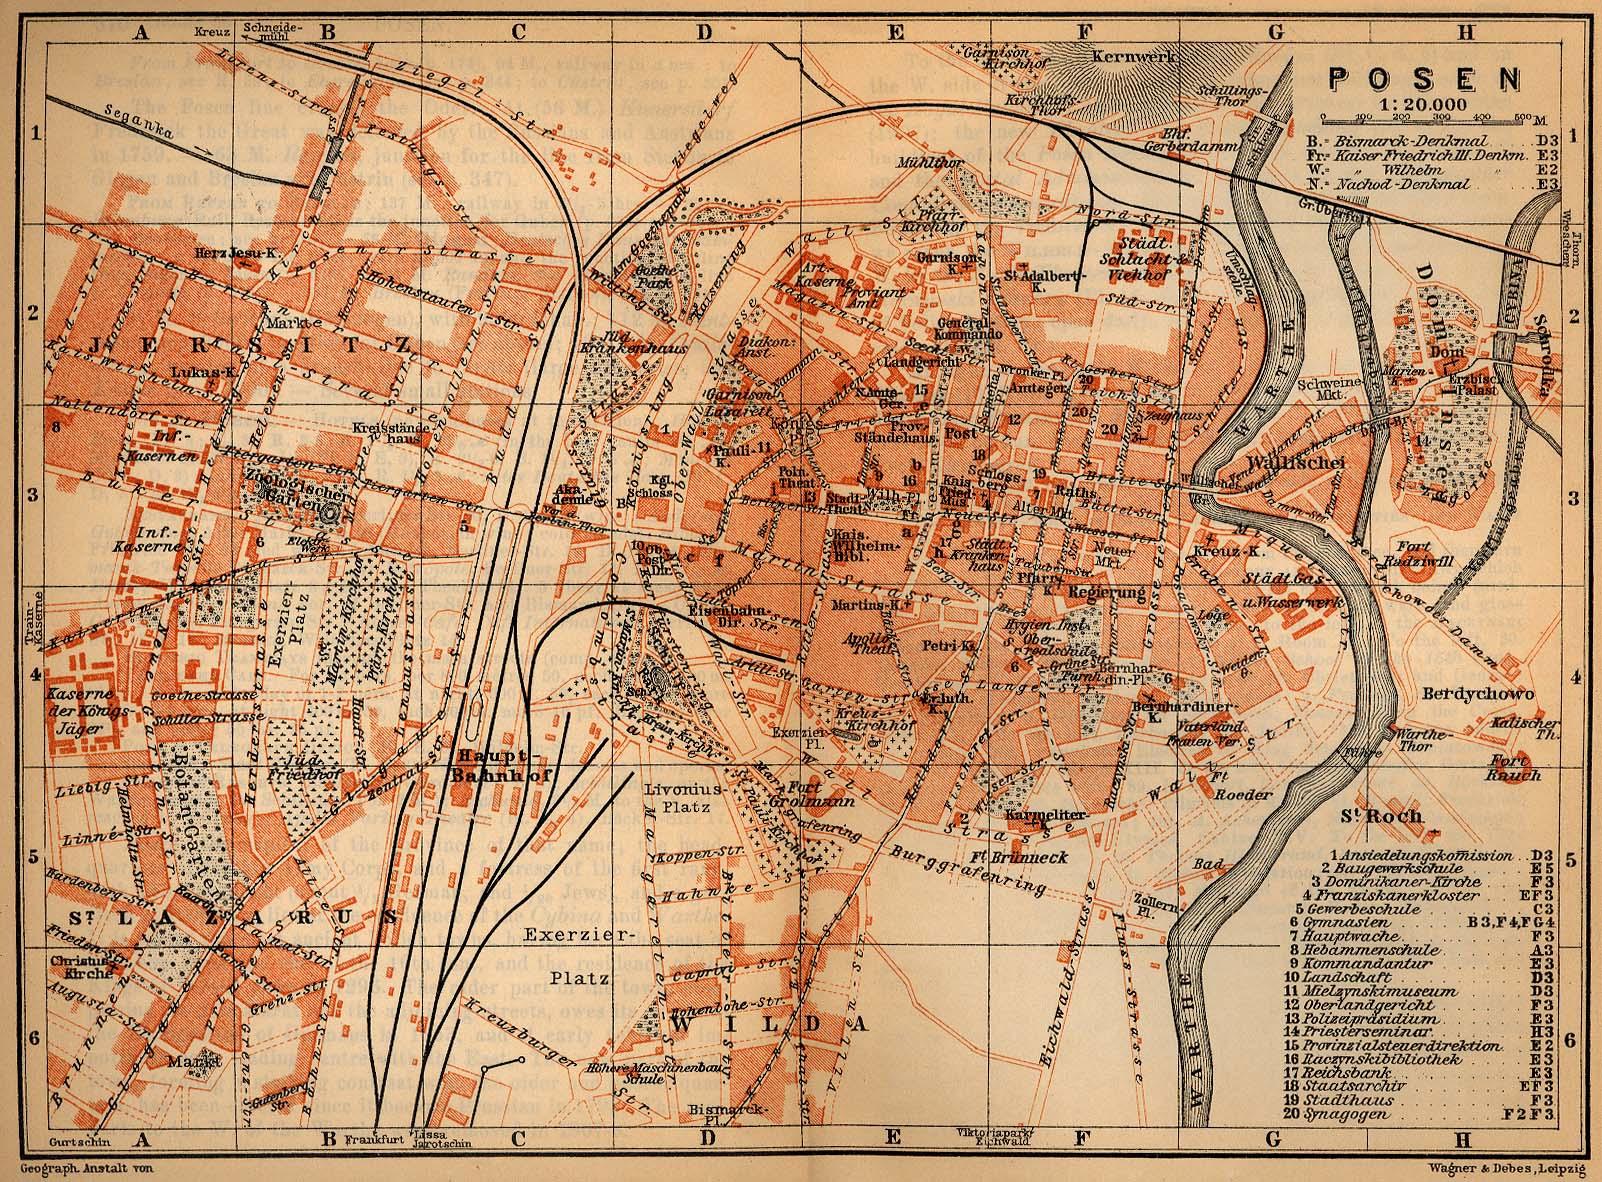 Mapa de Poznan (Posen), Polonia 1910